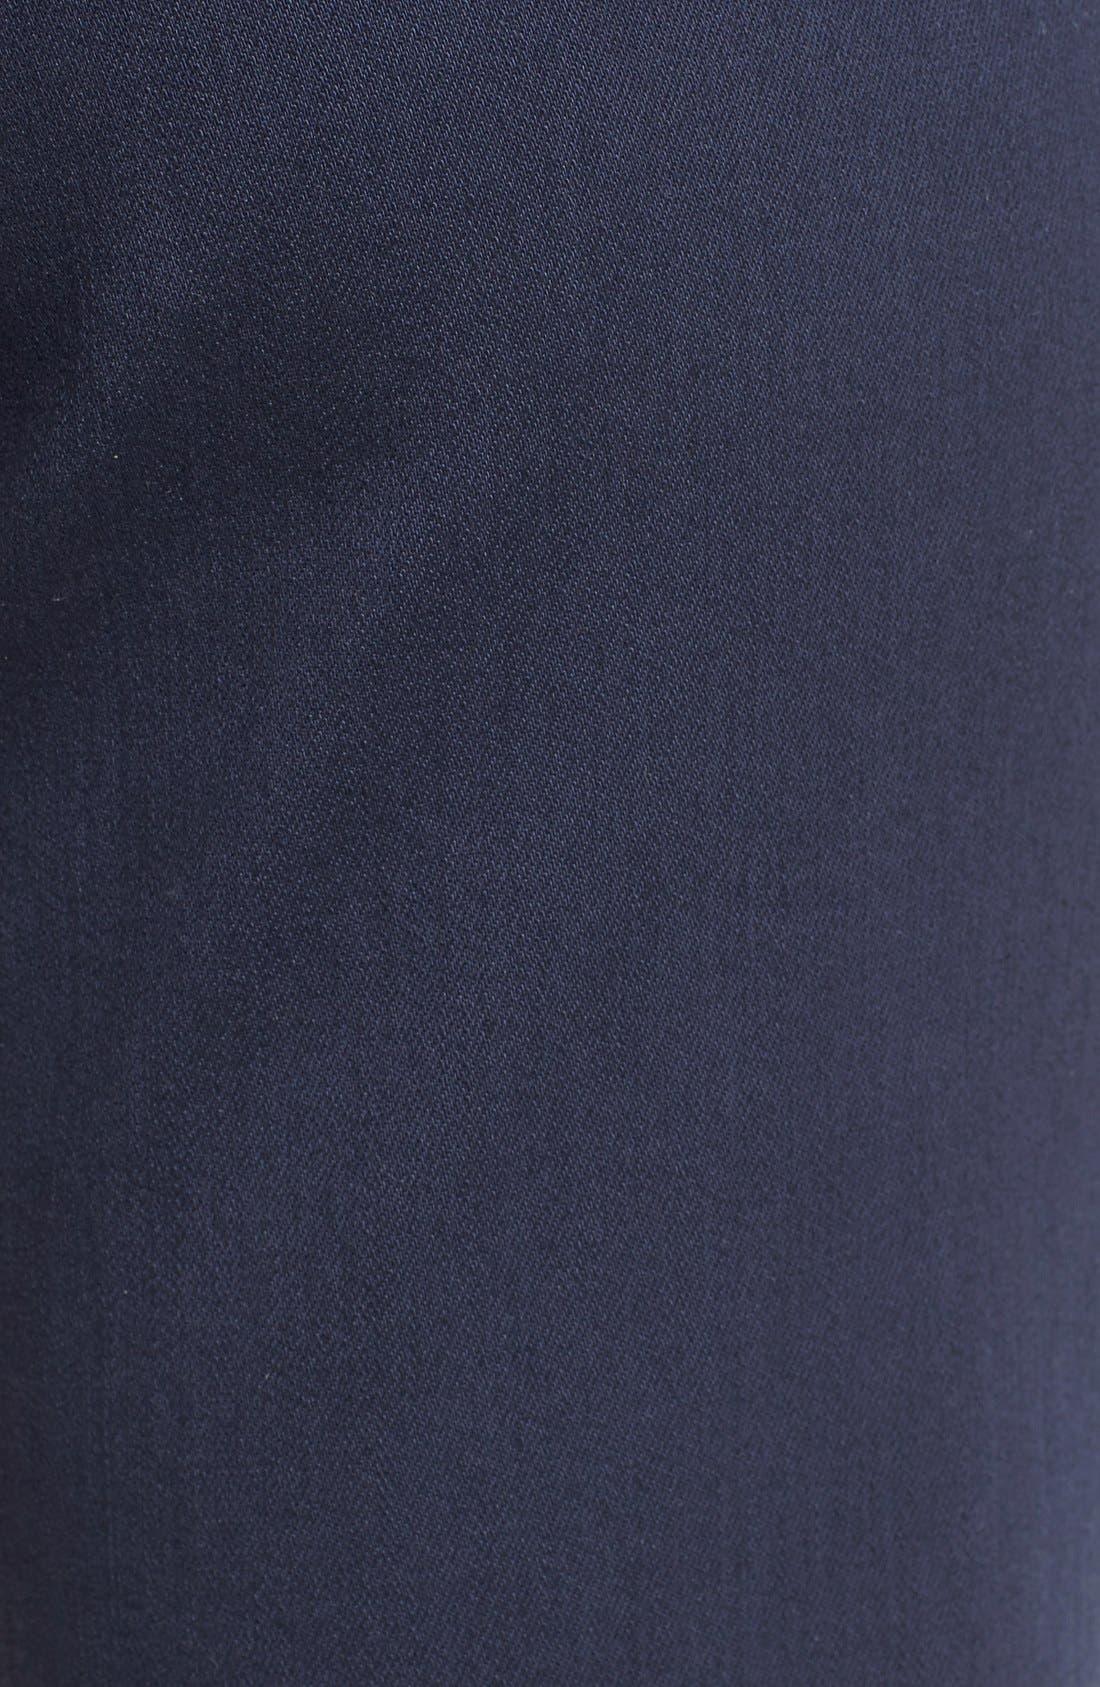 'Dayla' Colored Wide Cuff Capri Jeans,                             Alternate thumbnail 35, color,